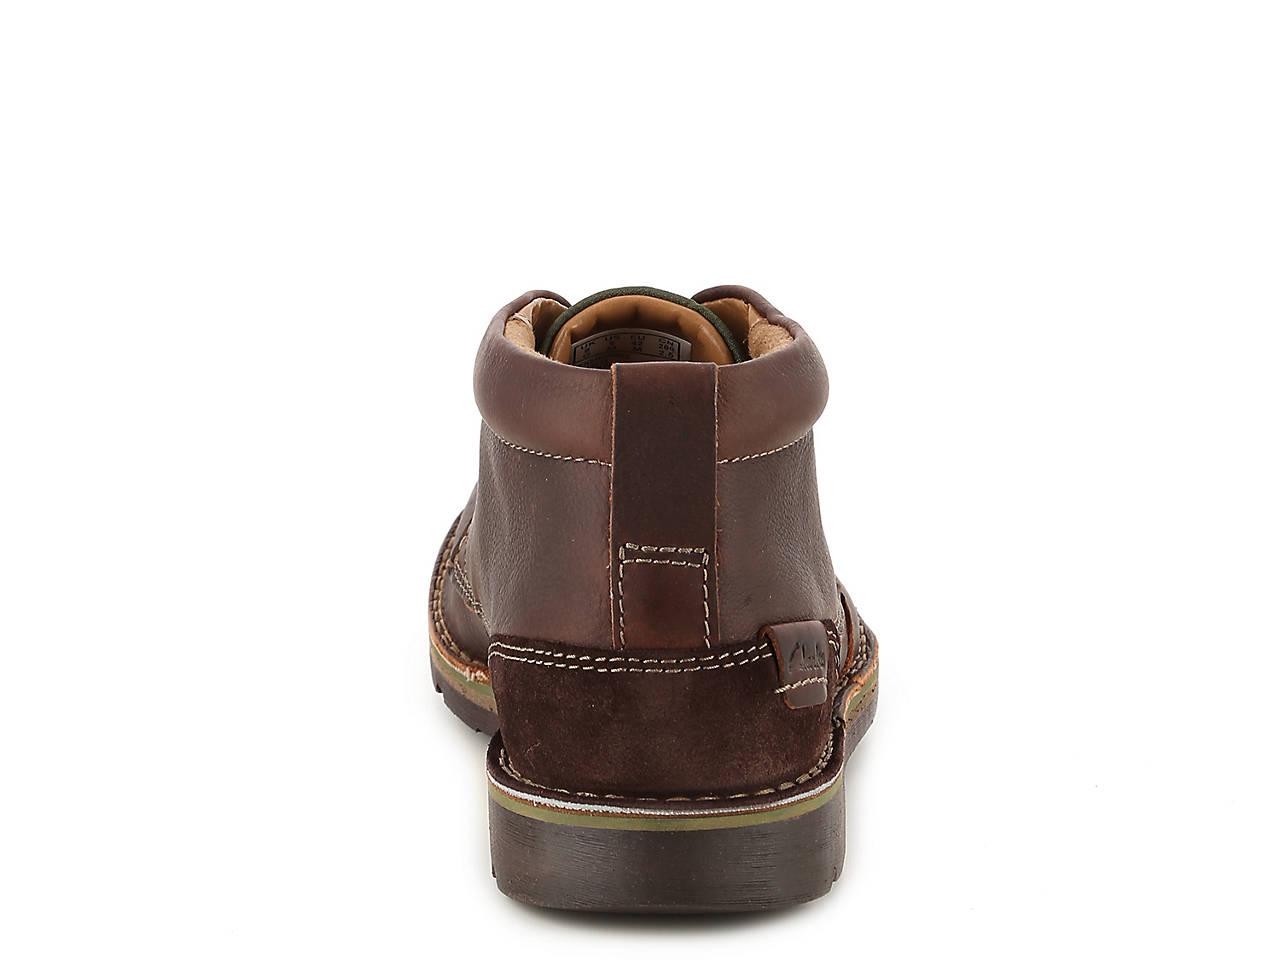 62857b4e06a6 Clarks Edgewick Chukka Boot Men s Shoes